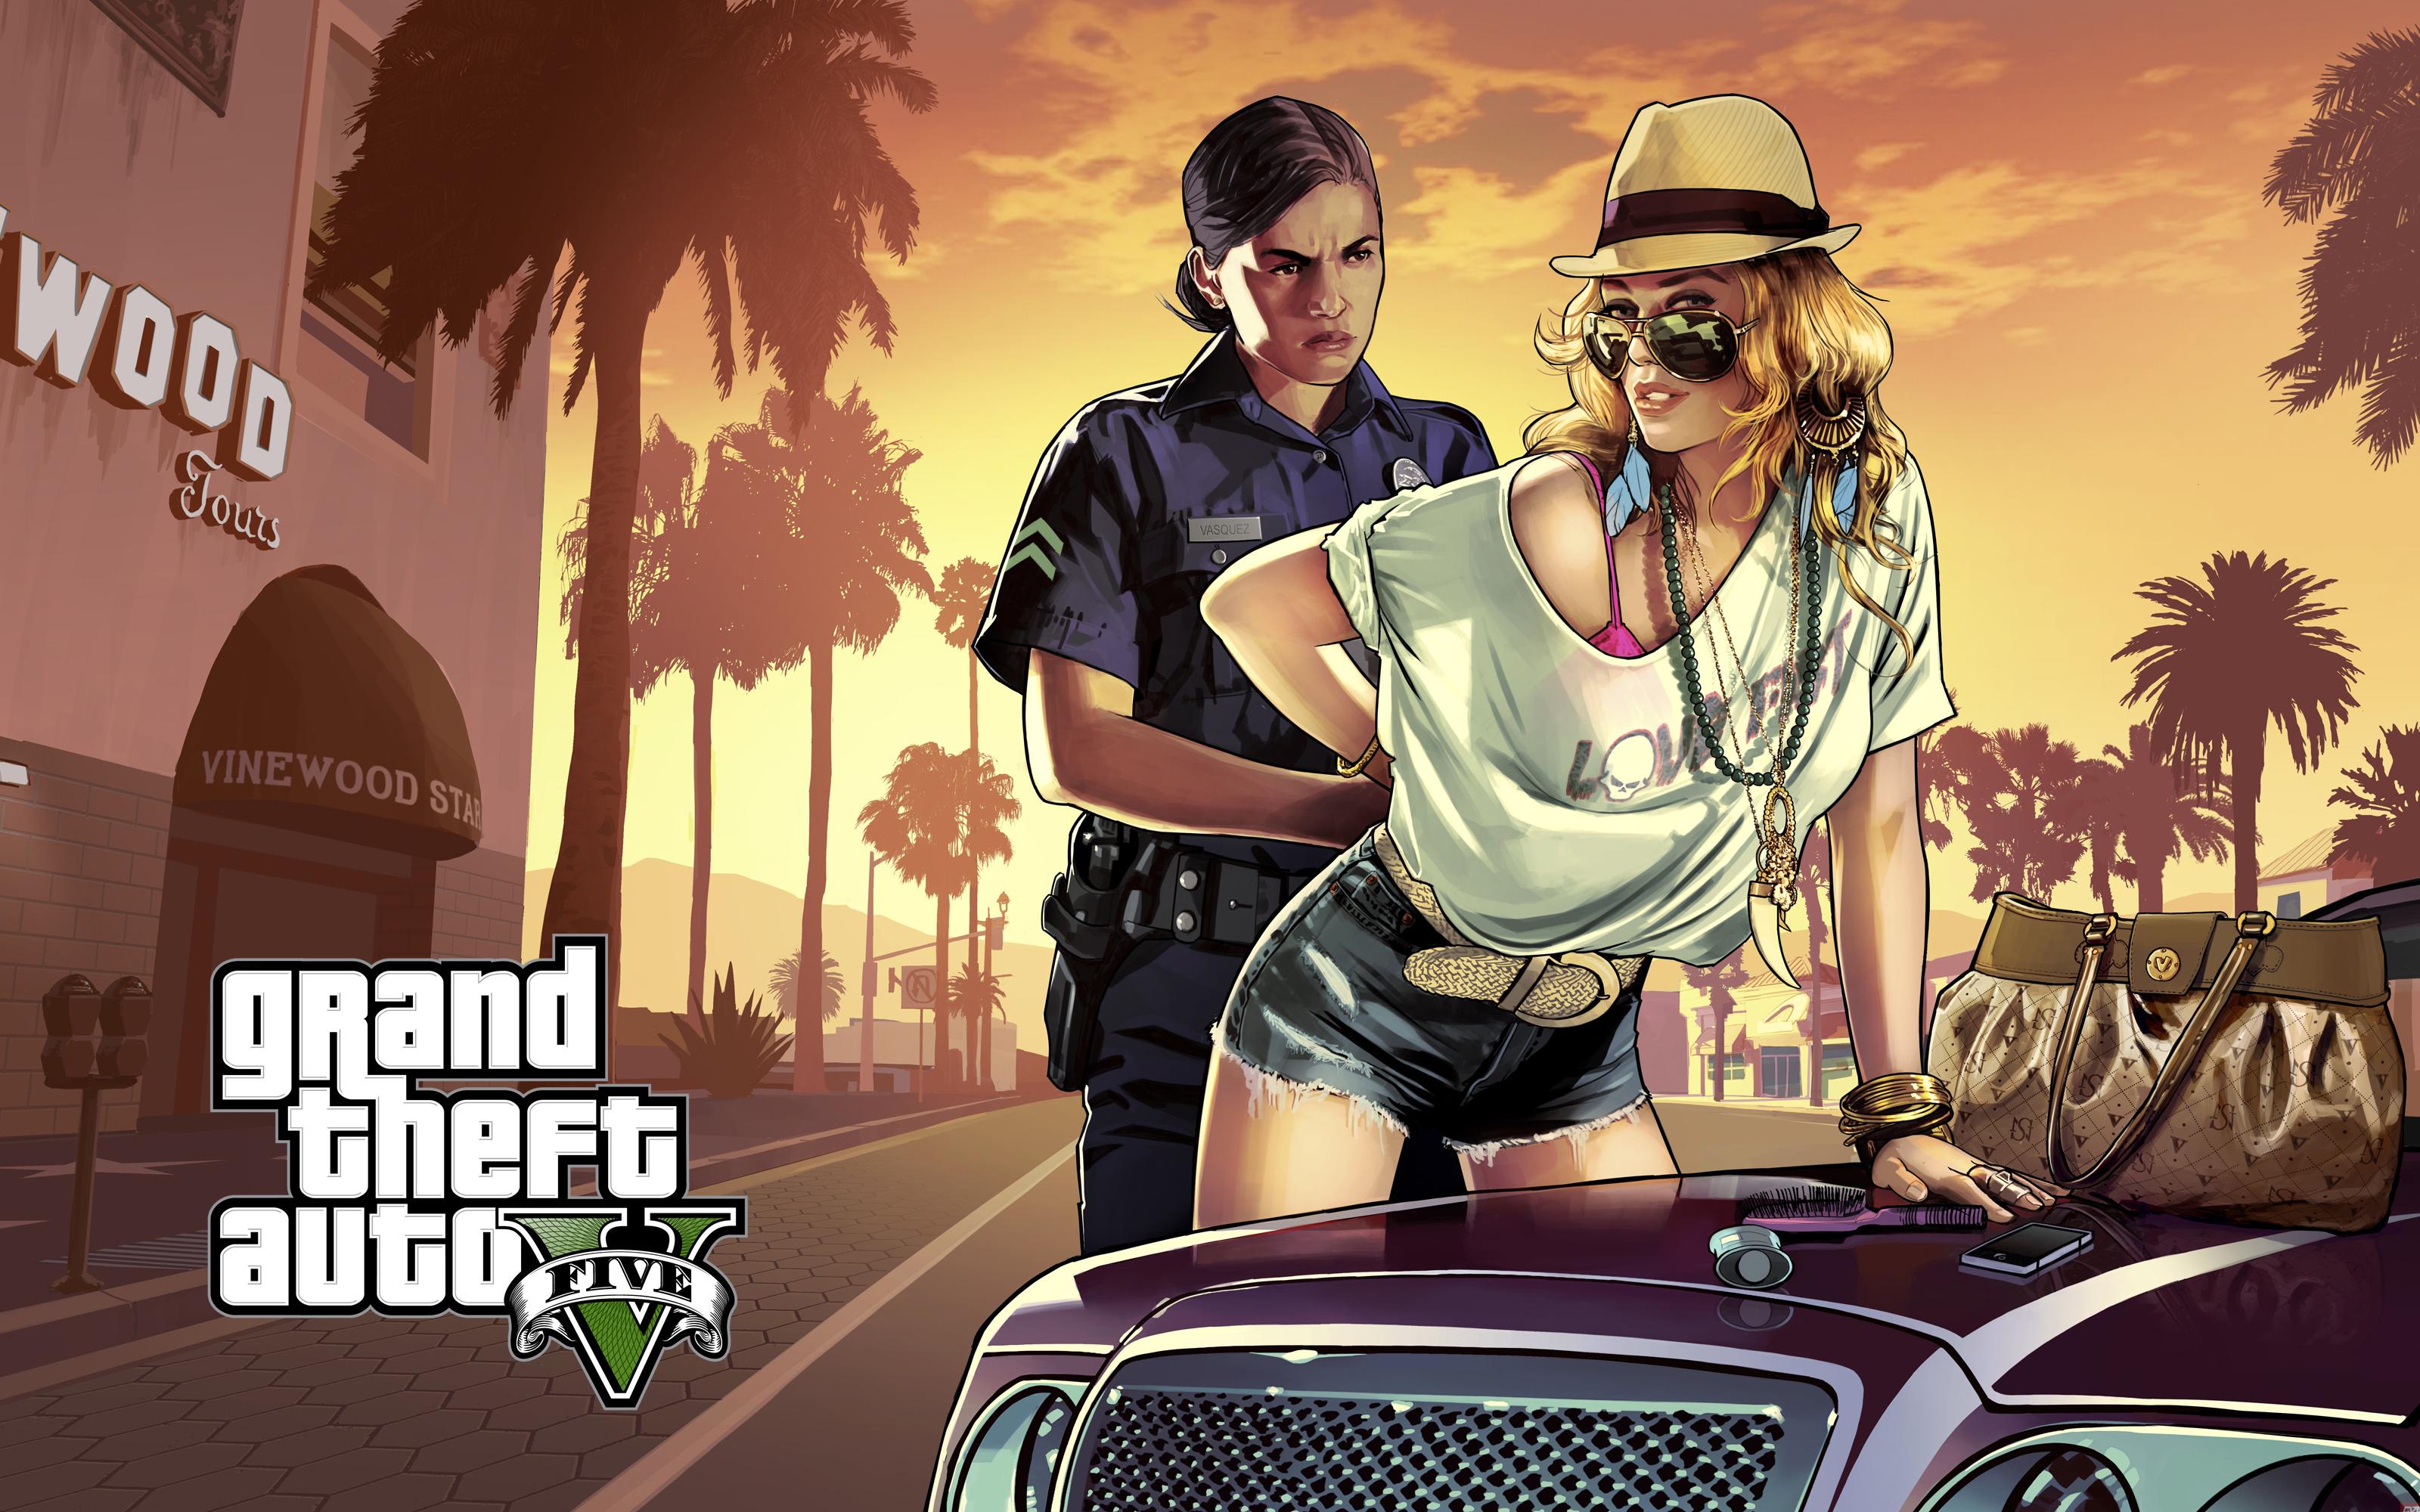 Grand Theft Auto V Walpapers HD   Taringa 3200x2000